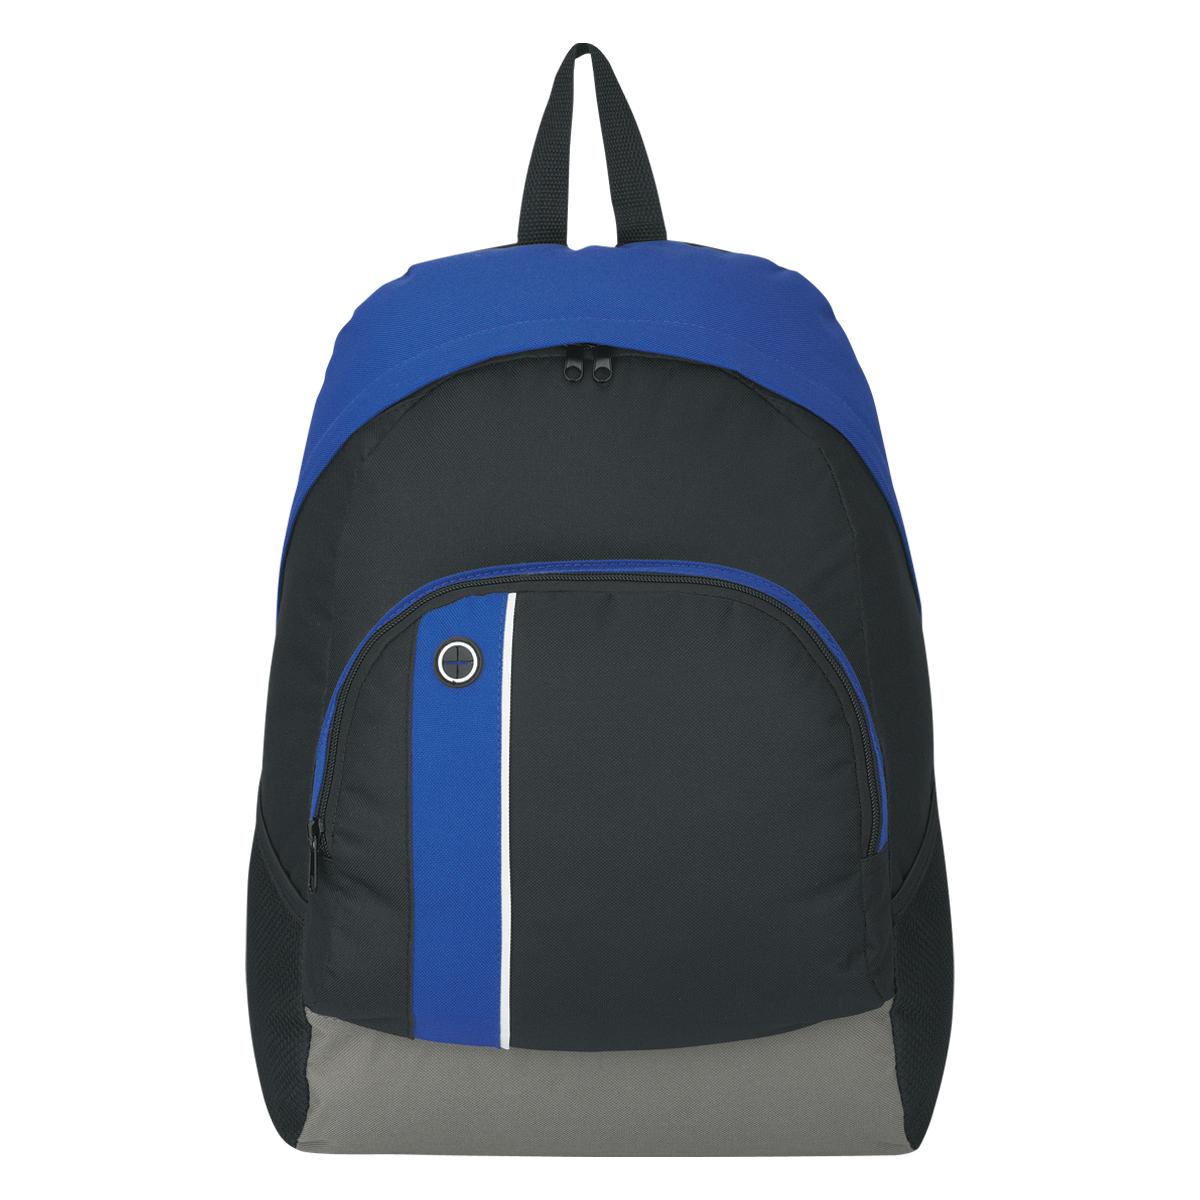 3421 - Backpack escolar